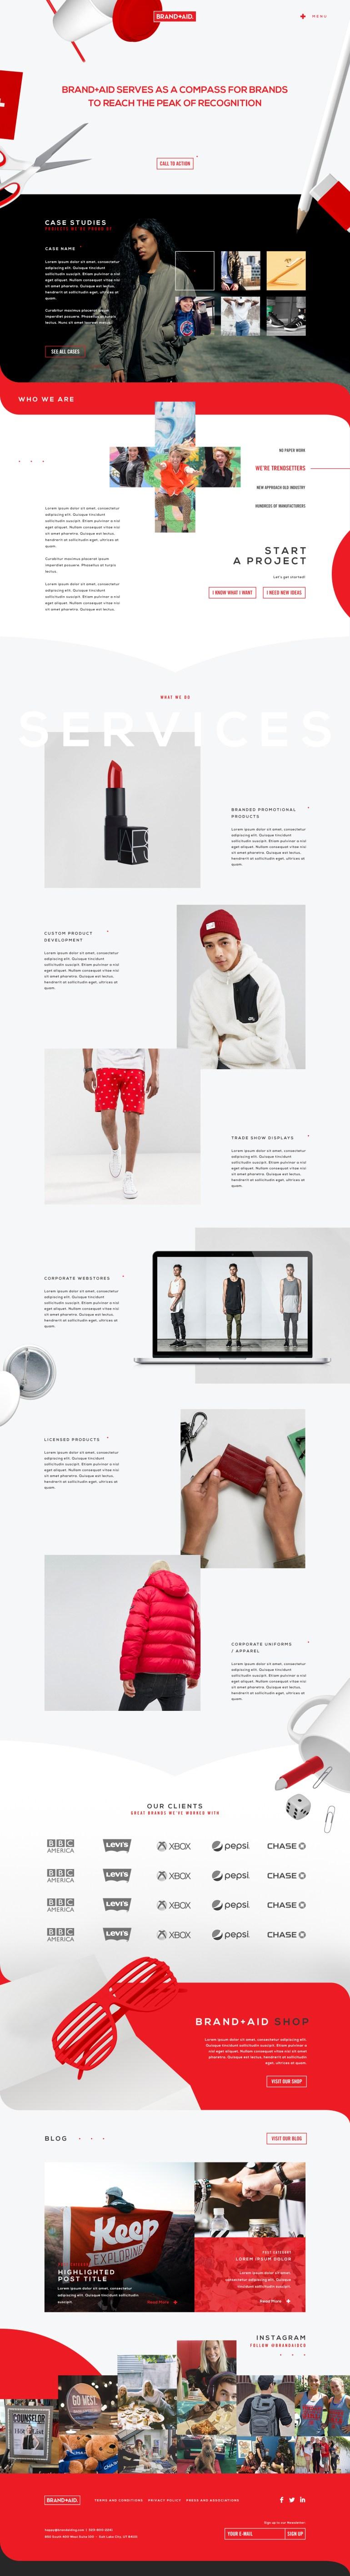 eat_brand+aid_website_v10